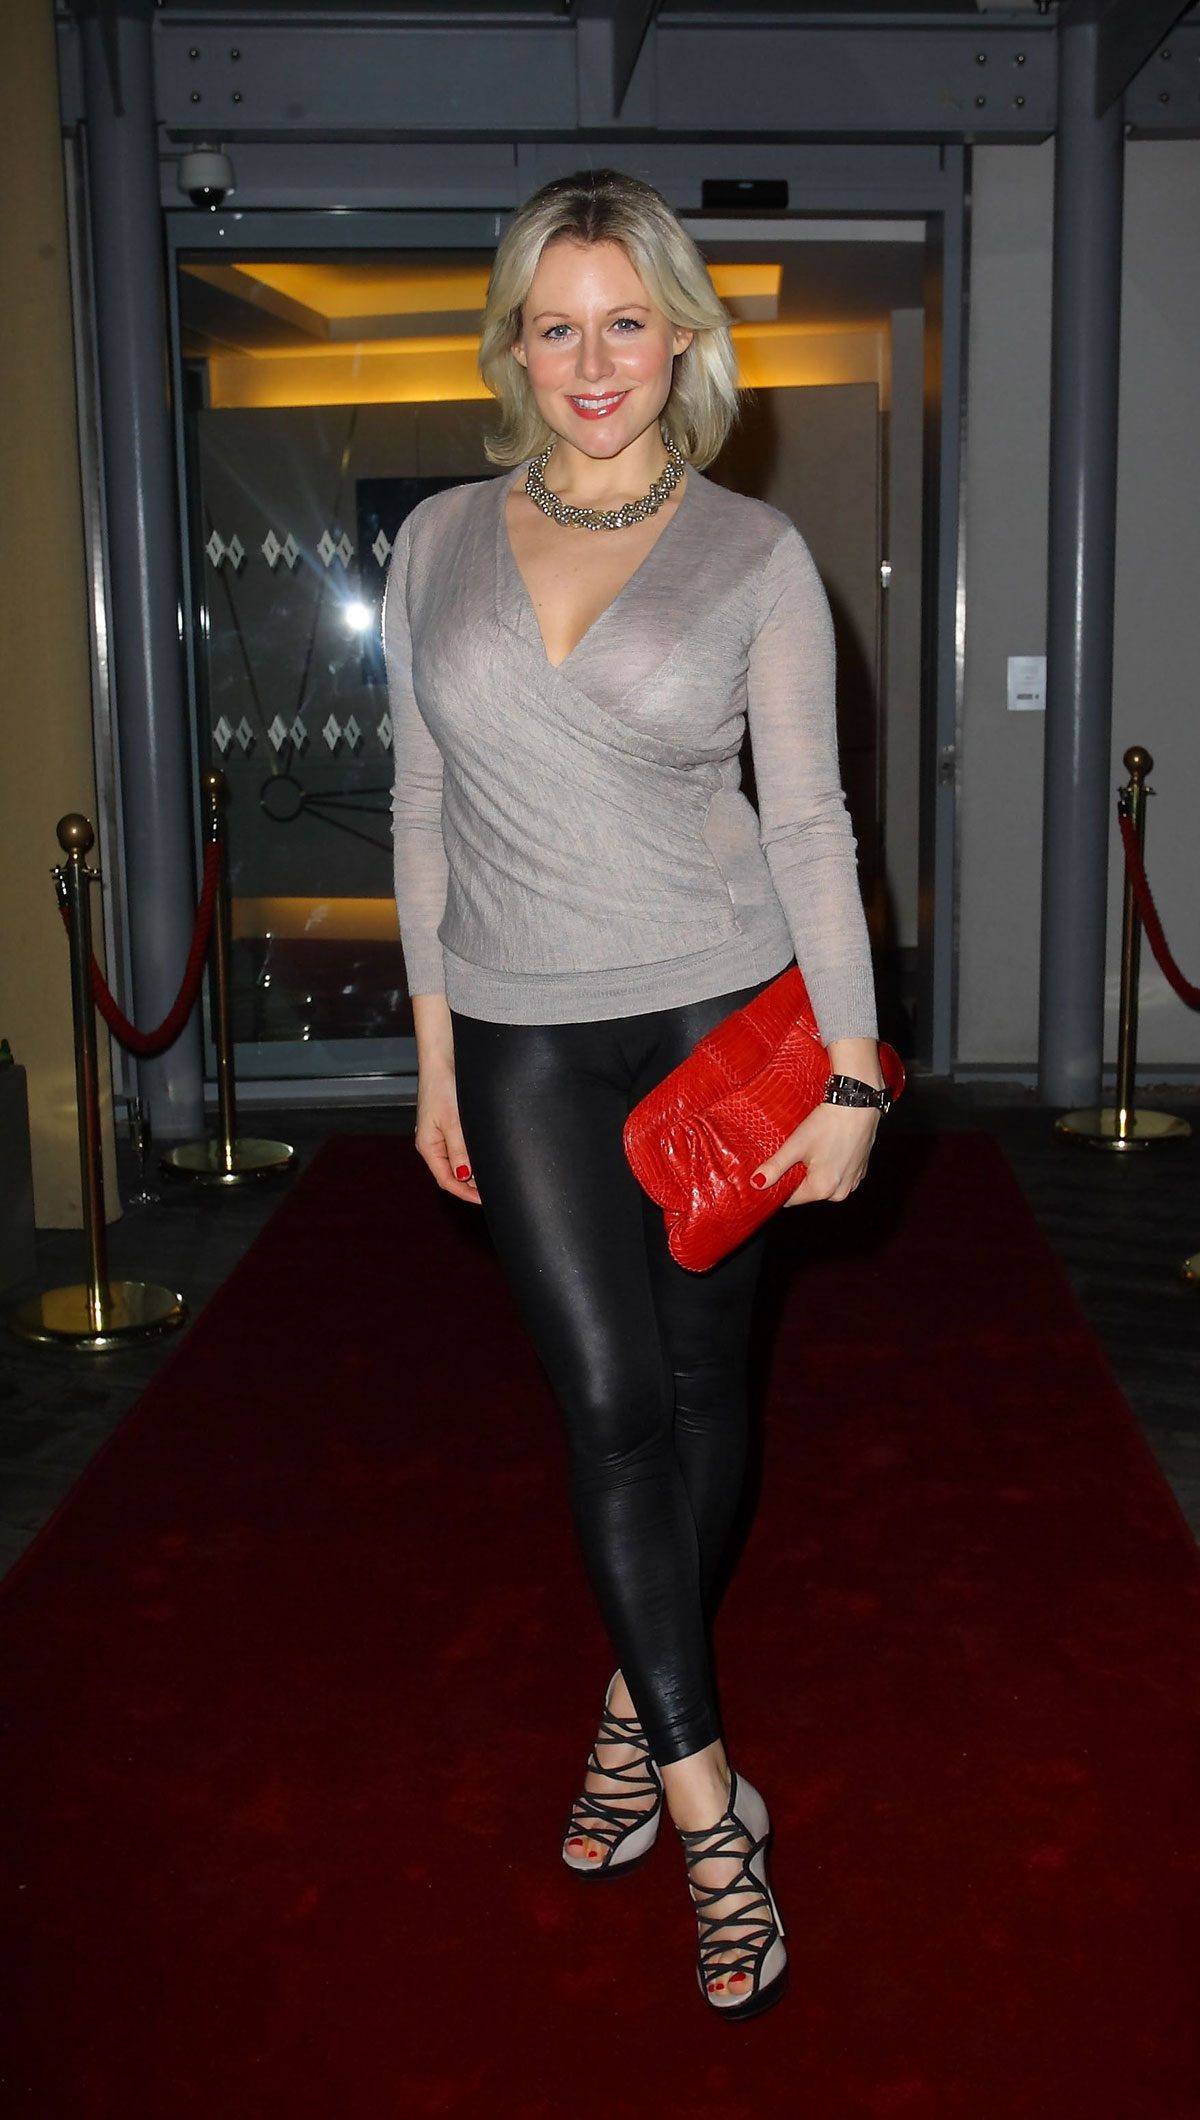 Abi Titmuss attends Hestia Charity Single Launch